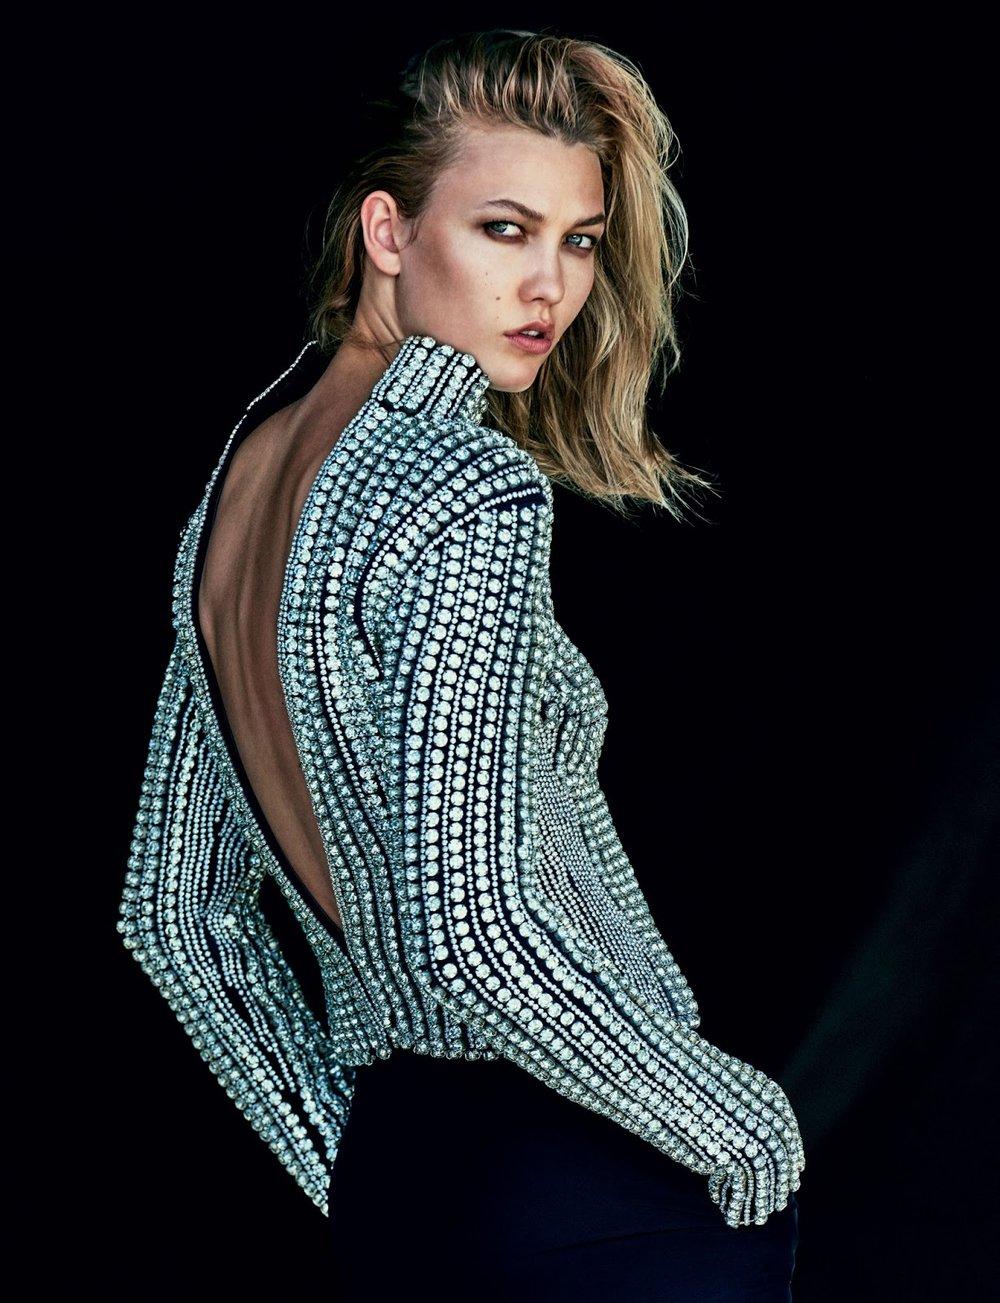 Vogue Mexico October 2016 - karlie-kloss-chris-colls- (6).jpg